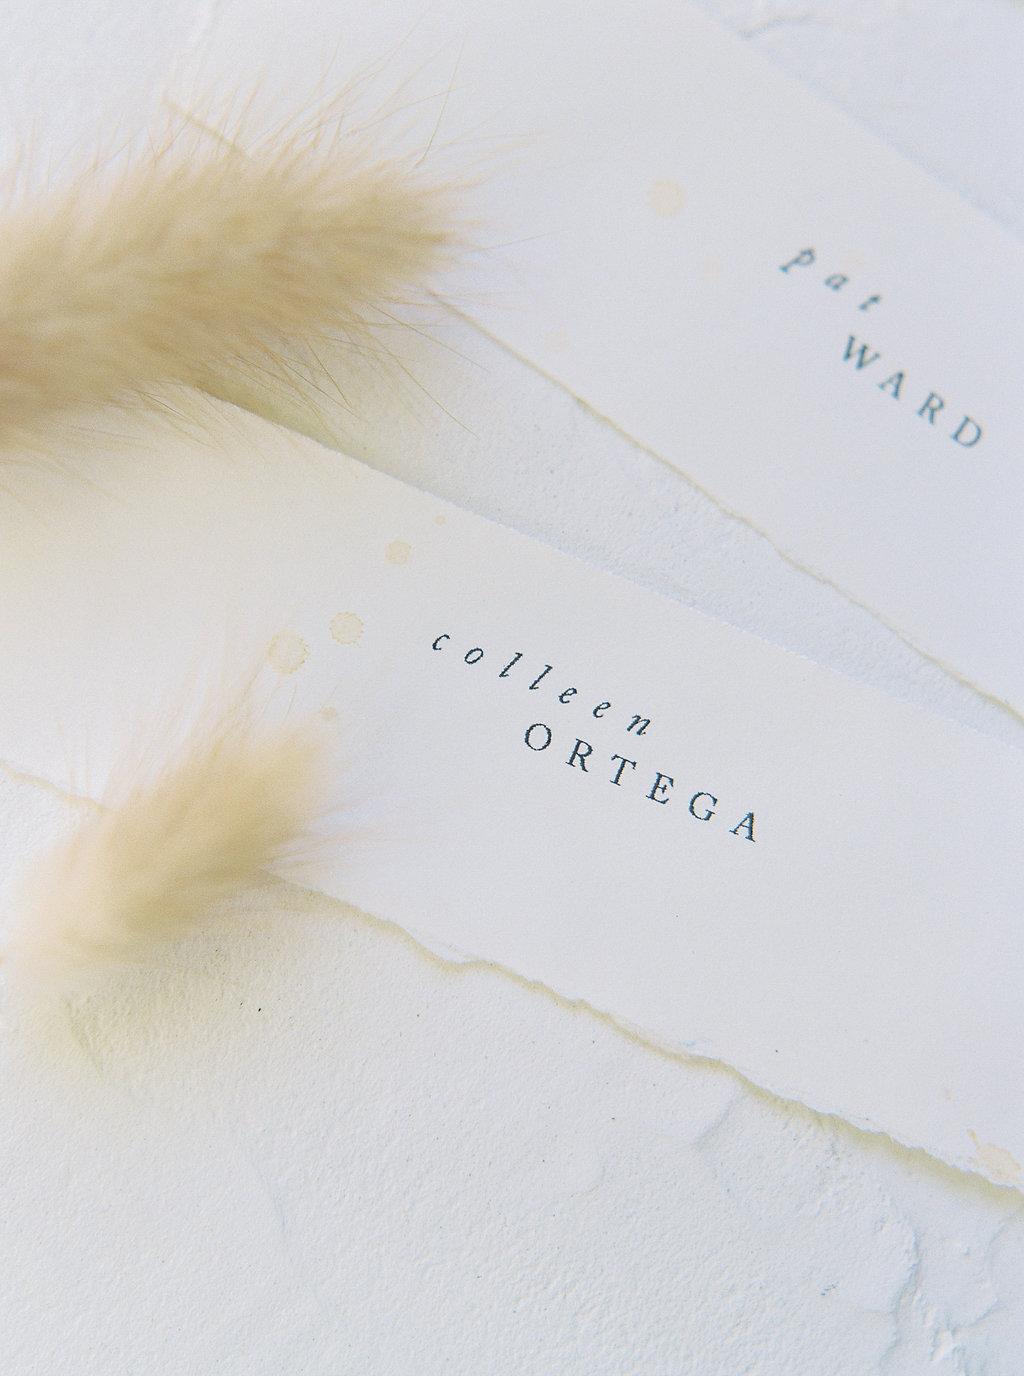 fall-wedding-Jenny-haas-Samantha-joy-events-laurel-court-cincinnati-wedding-placecards